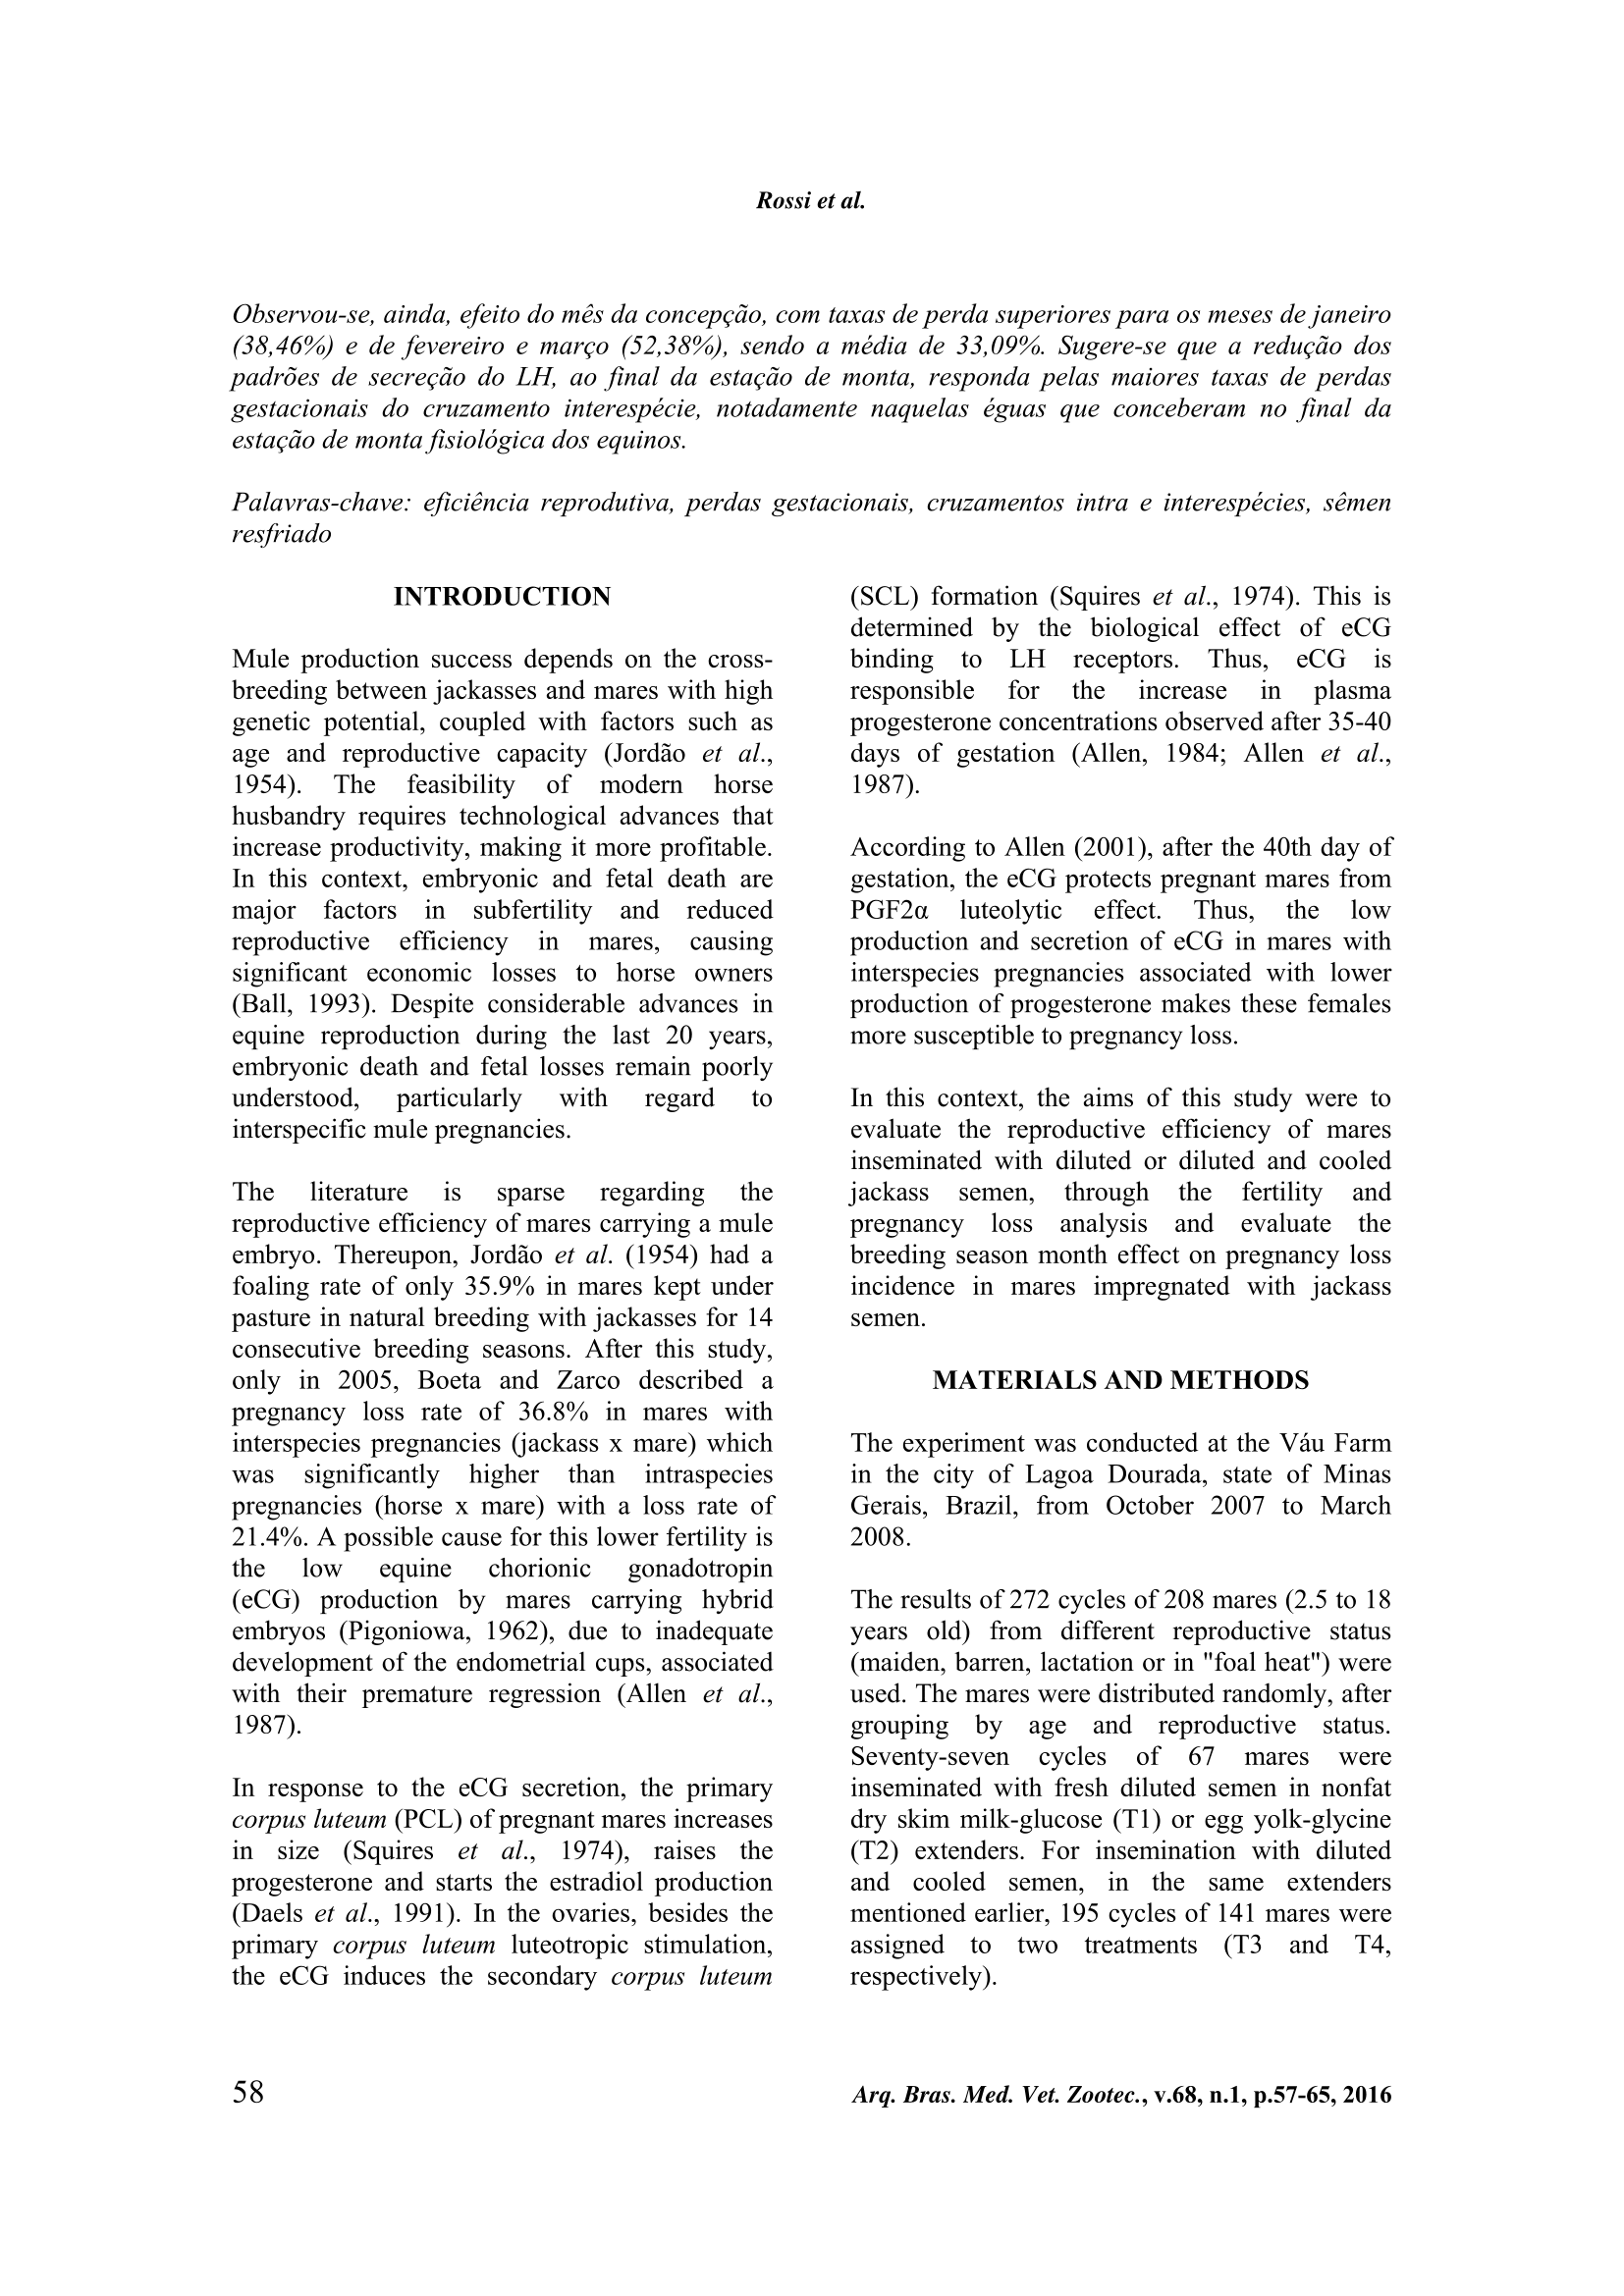 AMA 3-2 (1).png